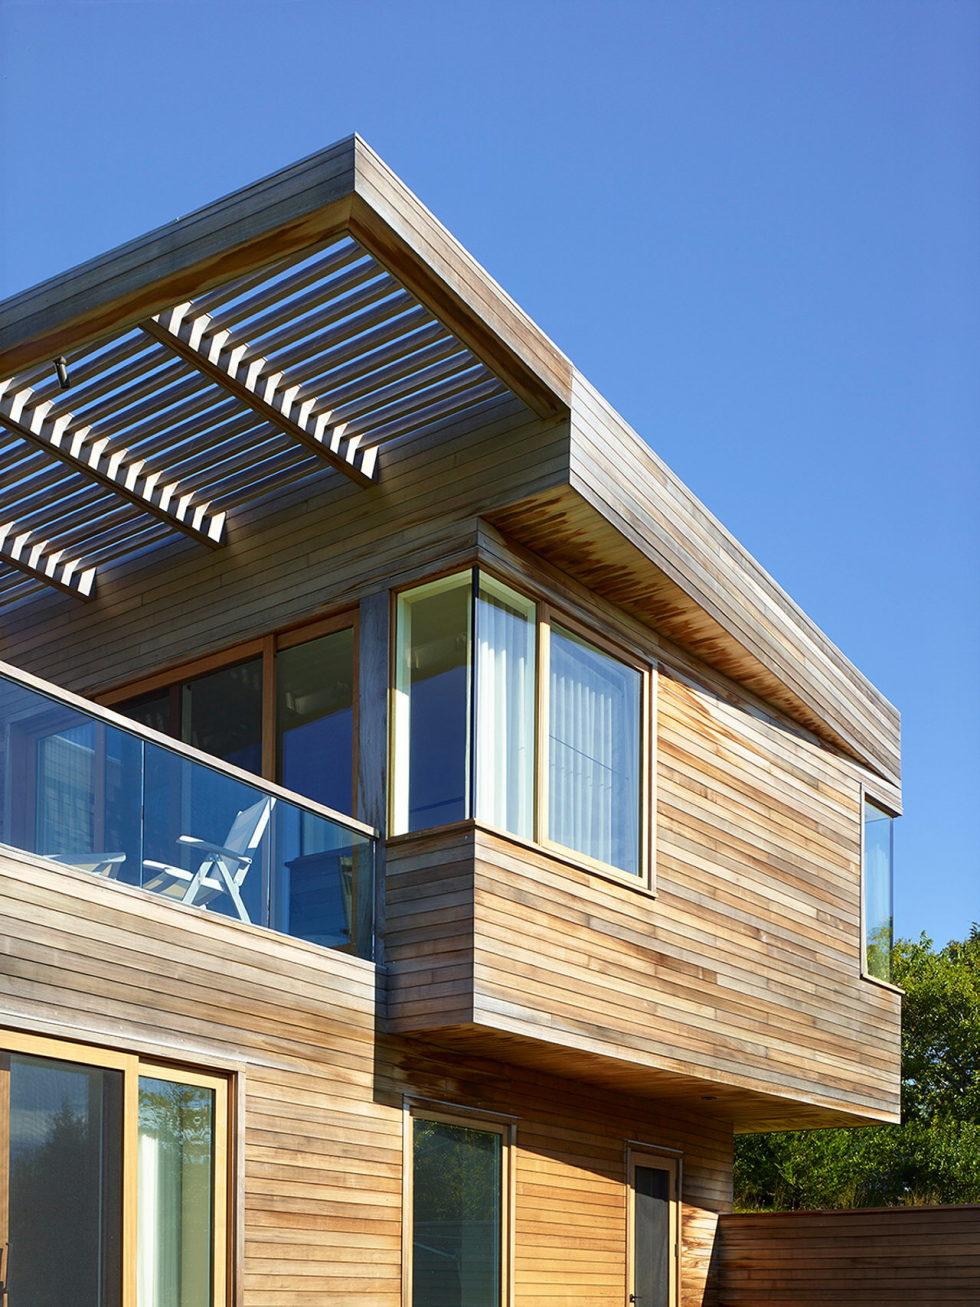 The Villa On The Martha Vineyard Island USA 3